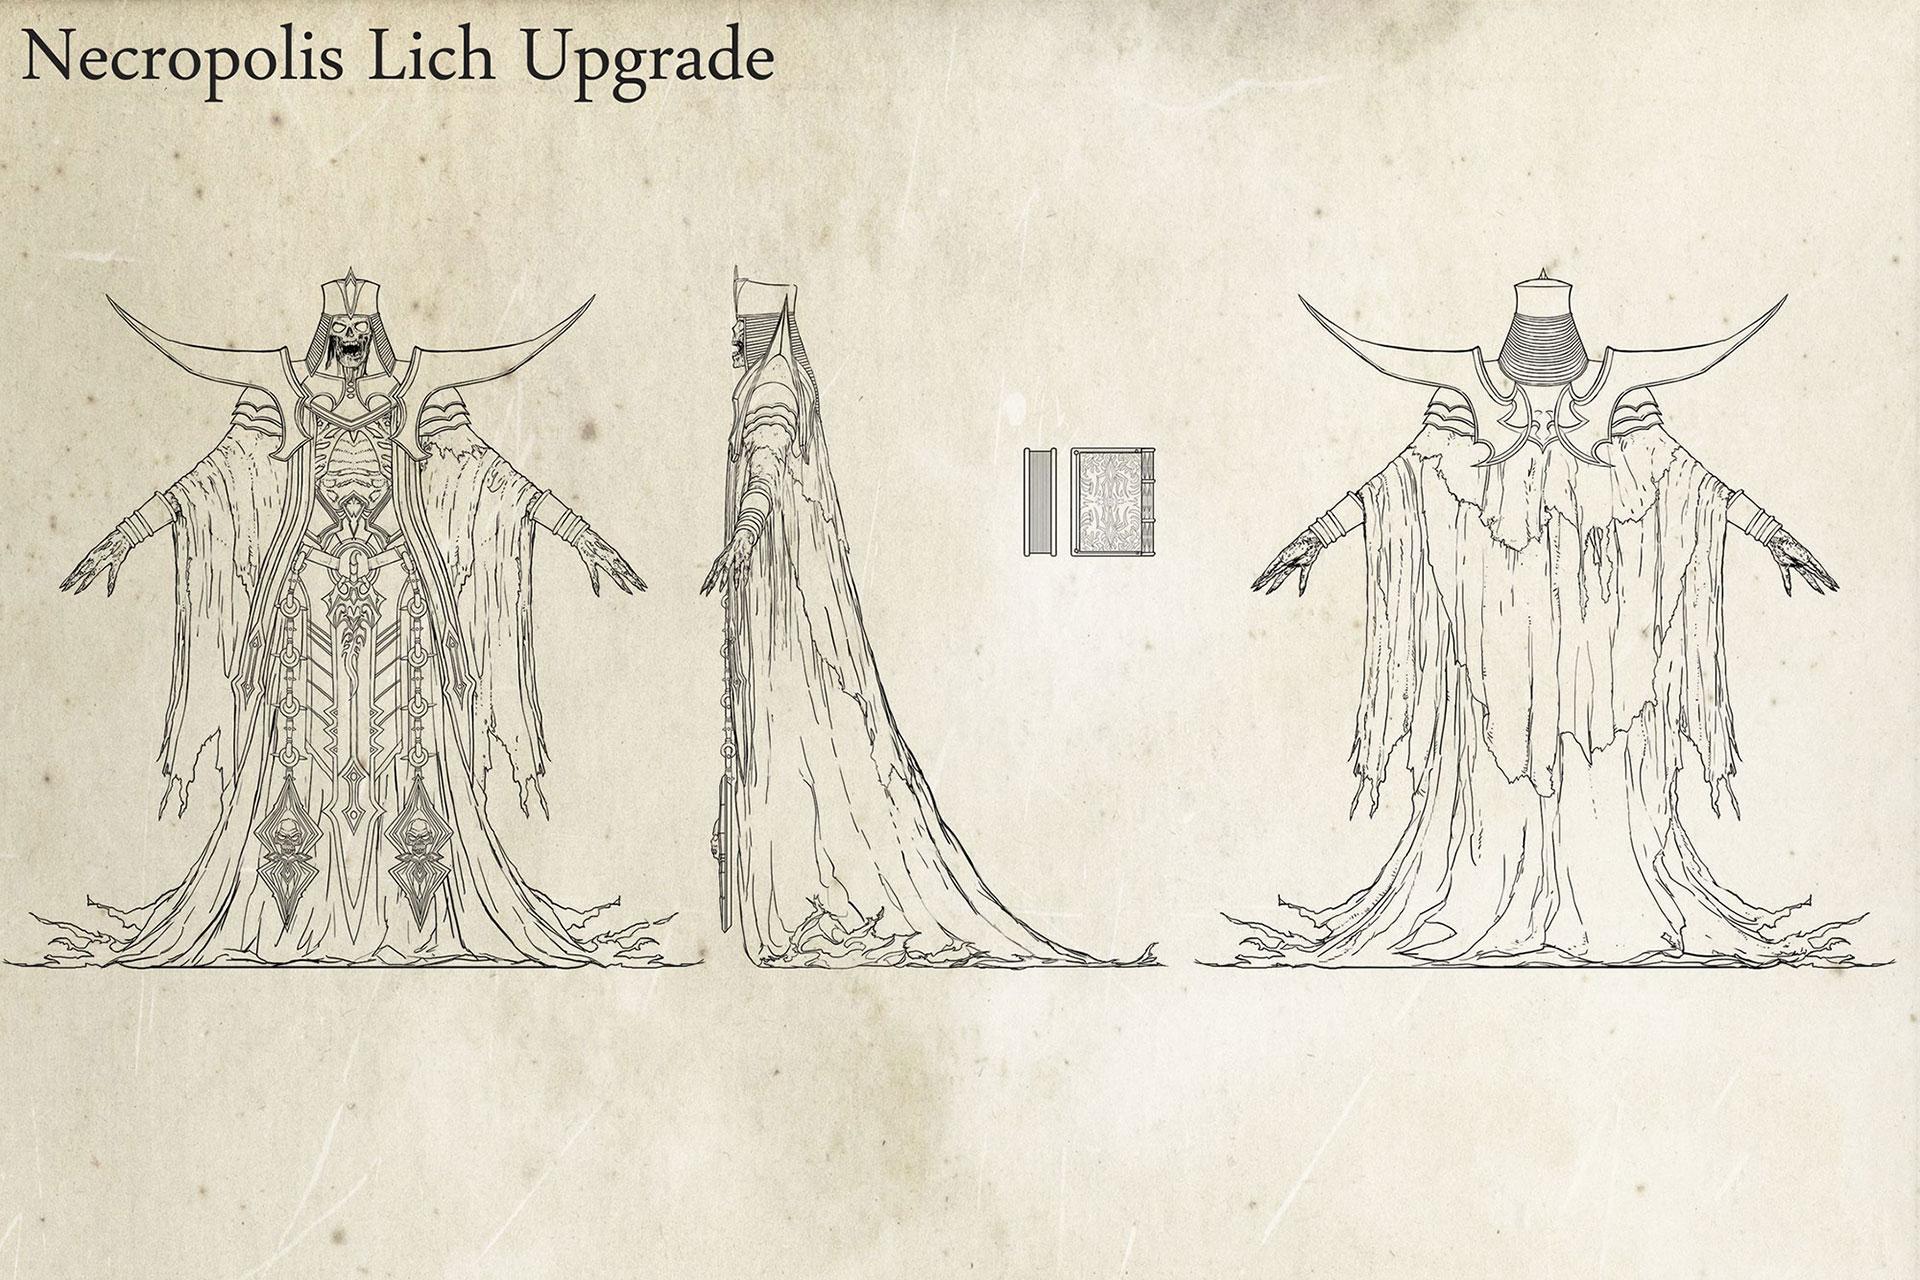 https://ubistatic-a.akamaihd.net/0004/prod/images/150722_cbe6ce5c83/Necro_Lich_Upg_T.jpg